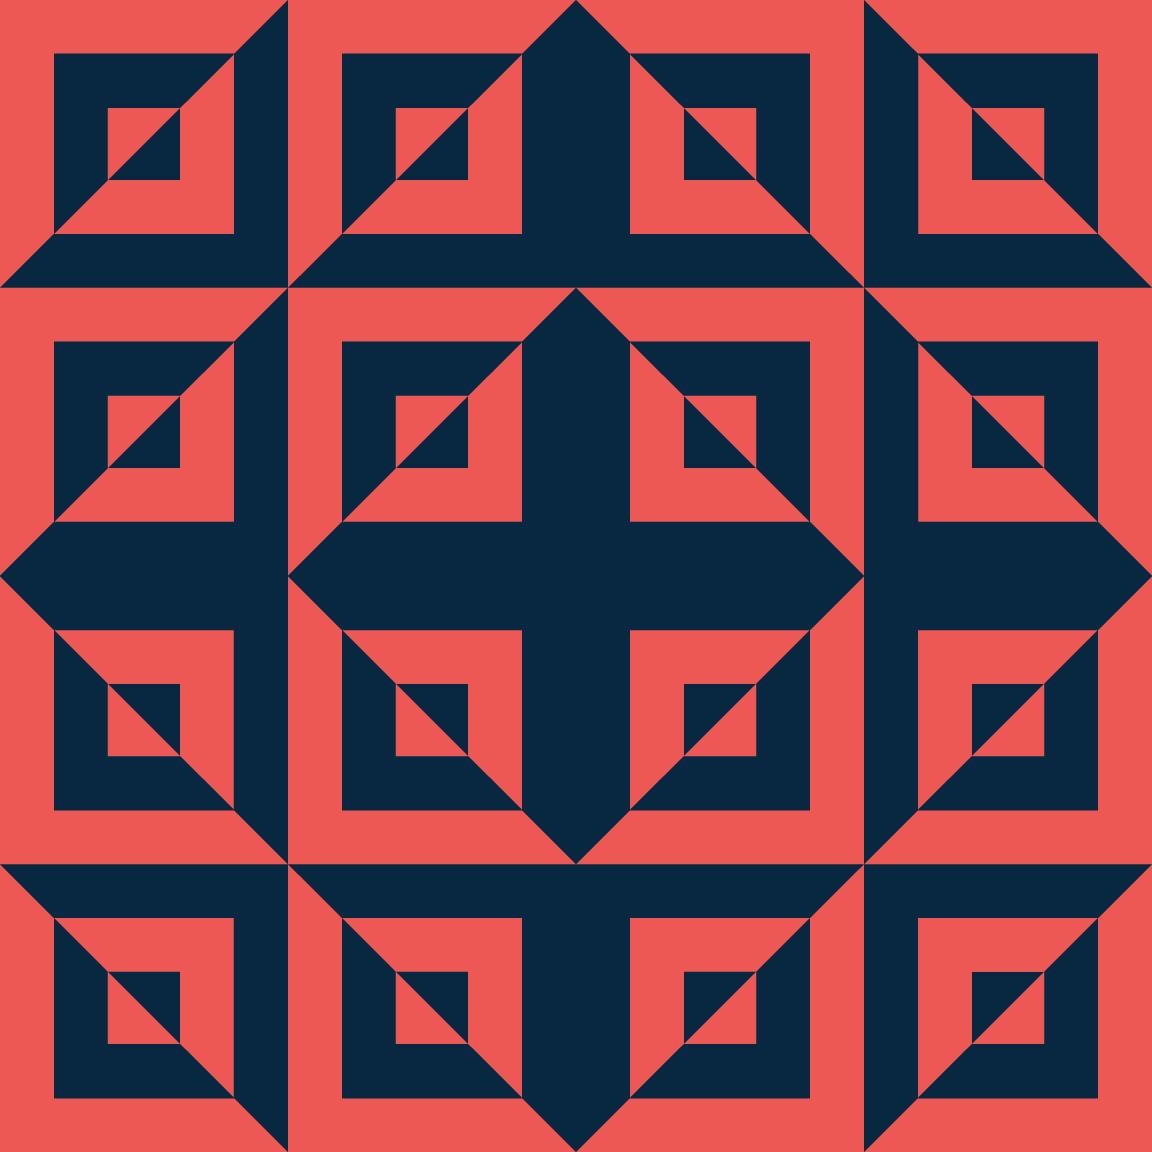 pattern_12.jpg